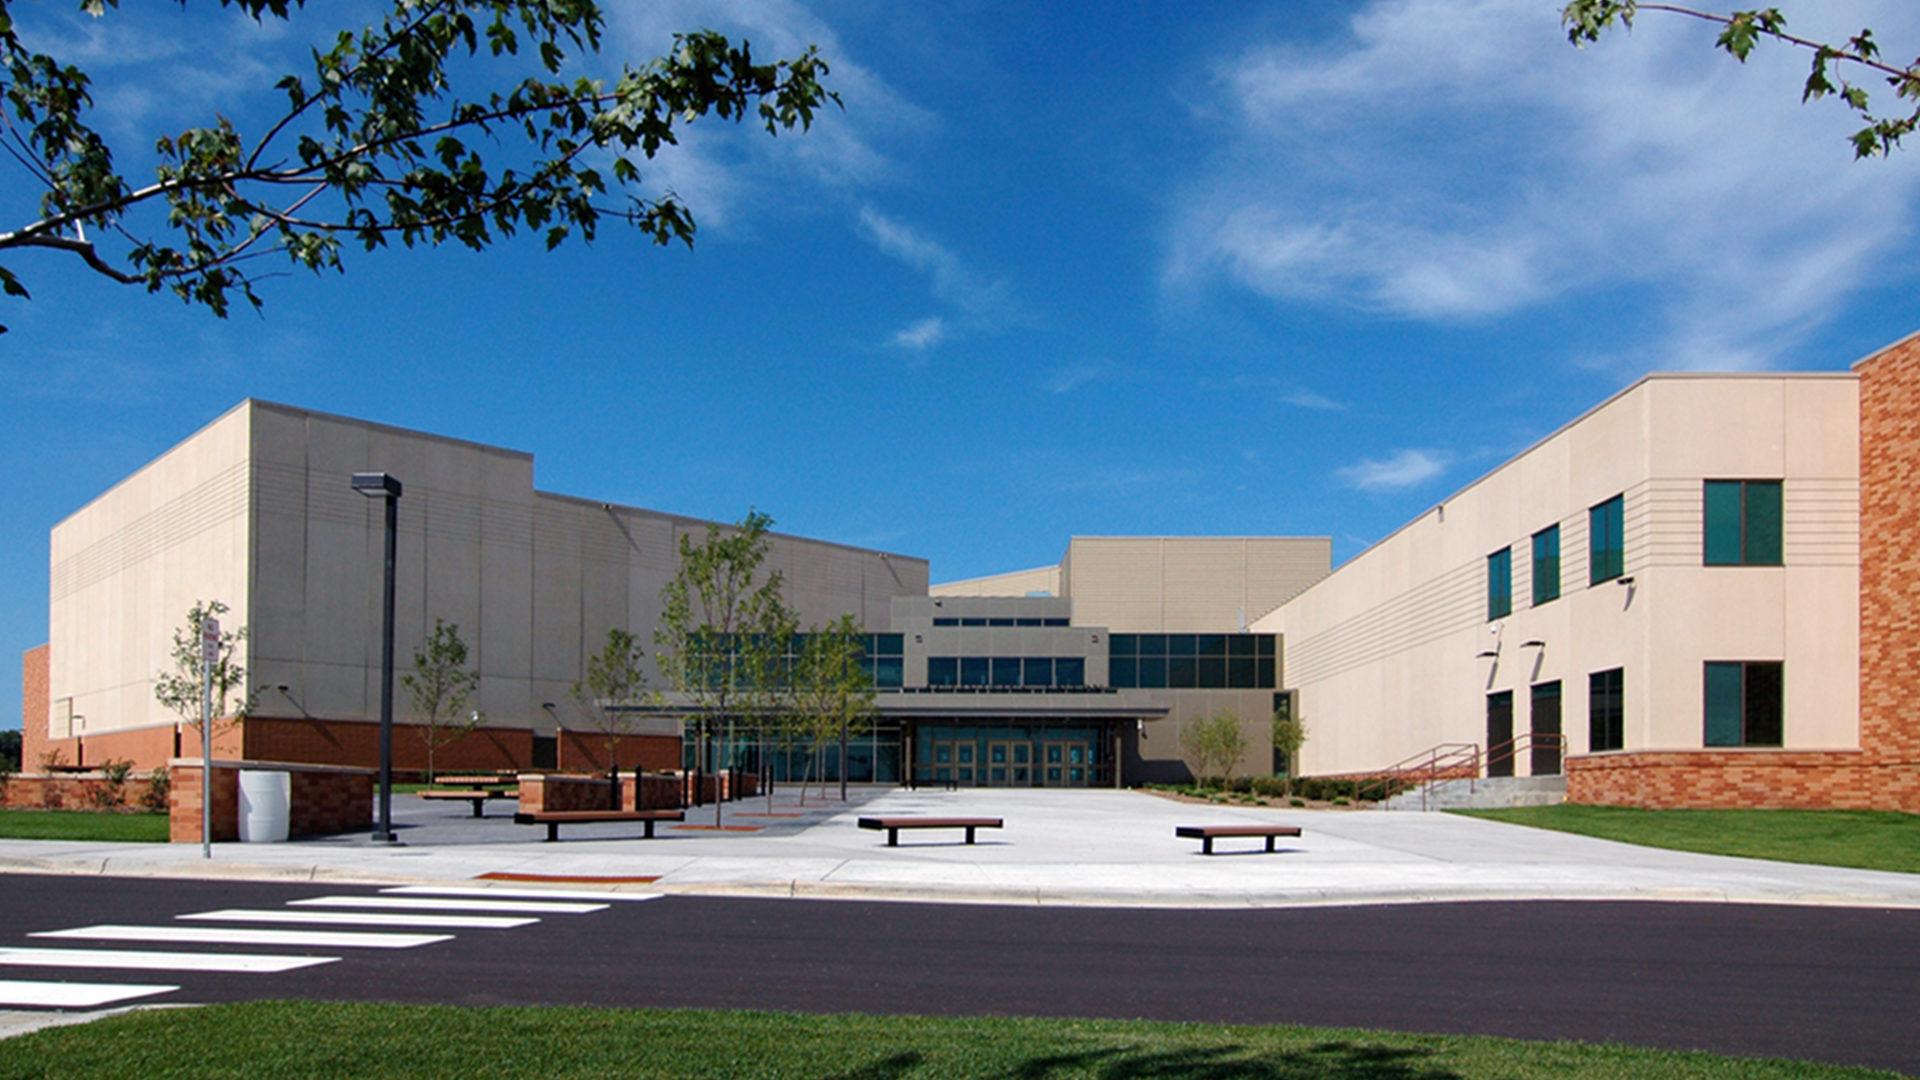 East Ridge High School Exterior Entrance for the Active Center